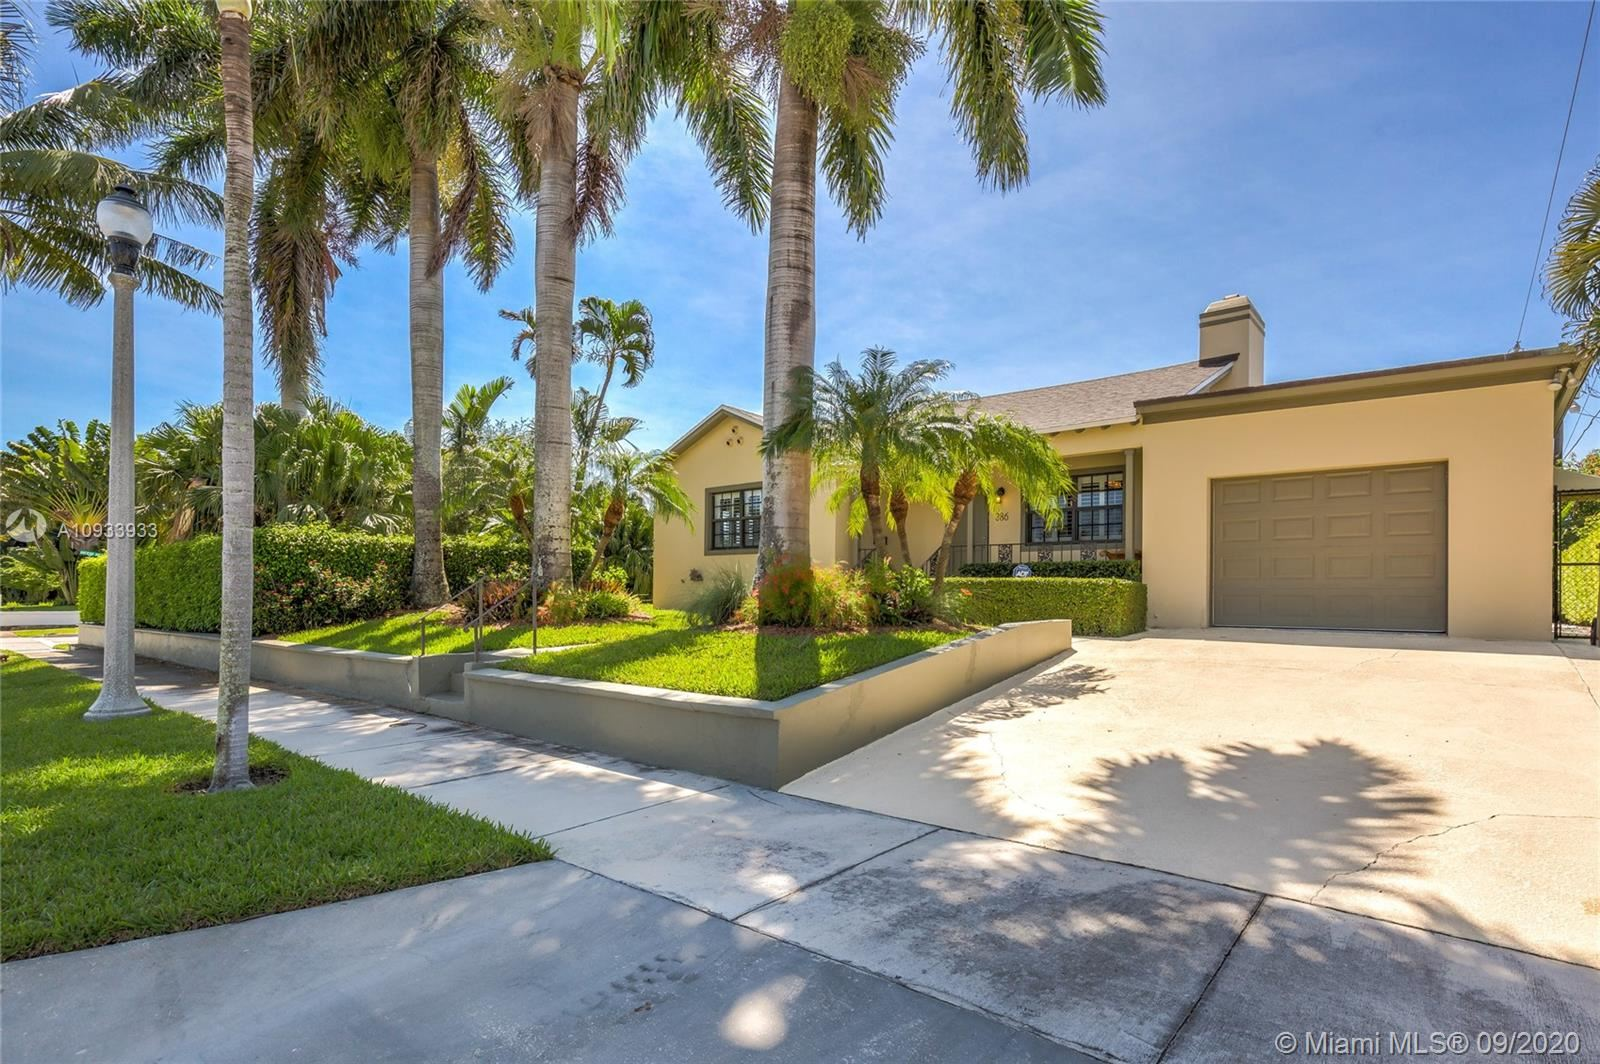 386 Palmetto St, West Palm Beach, FL 33405 - #: A10933933